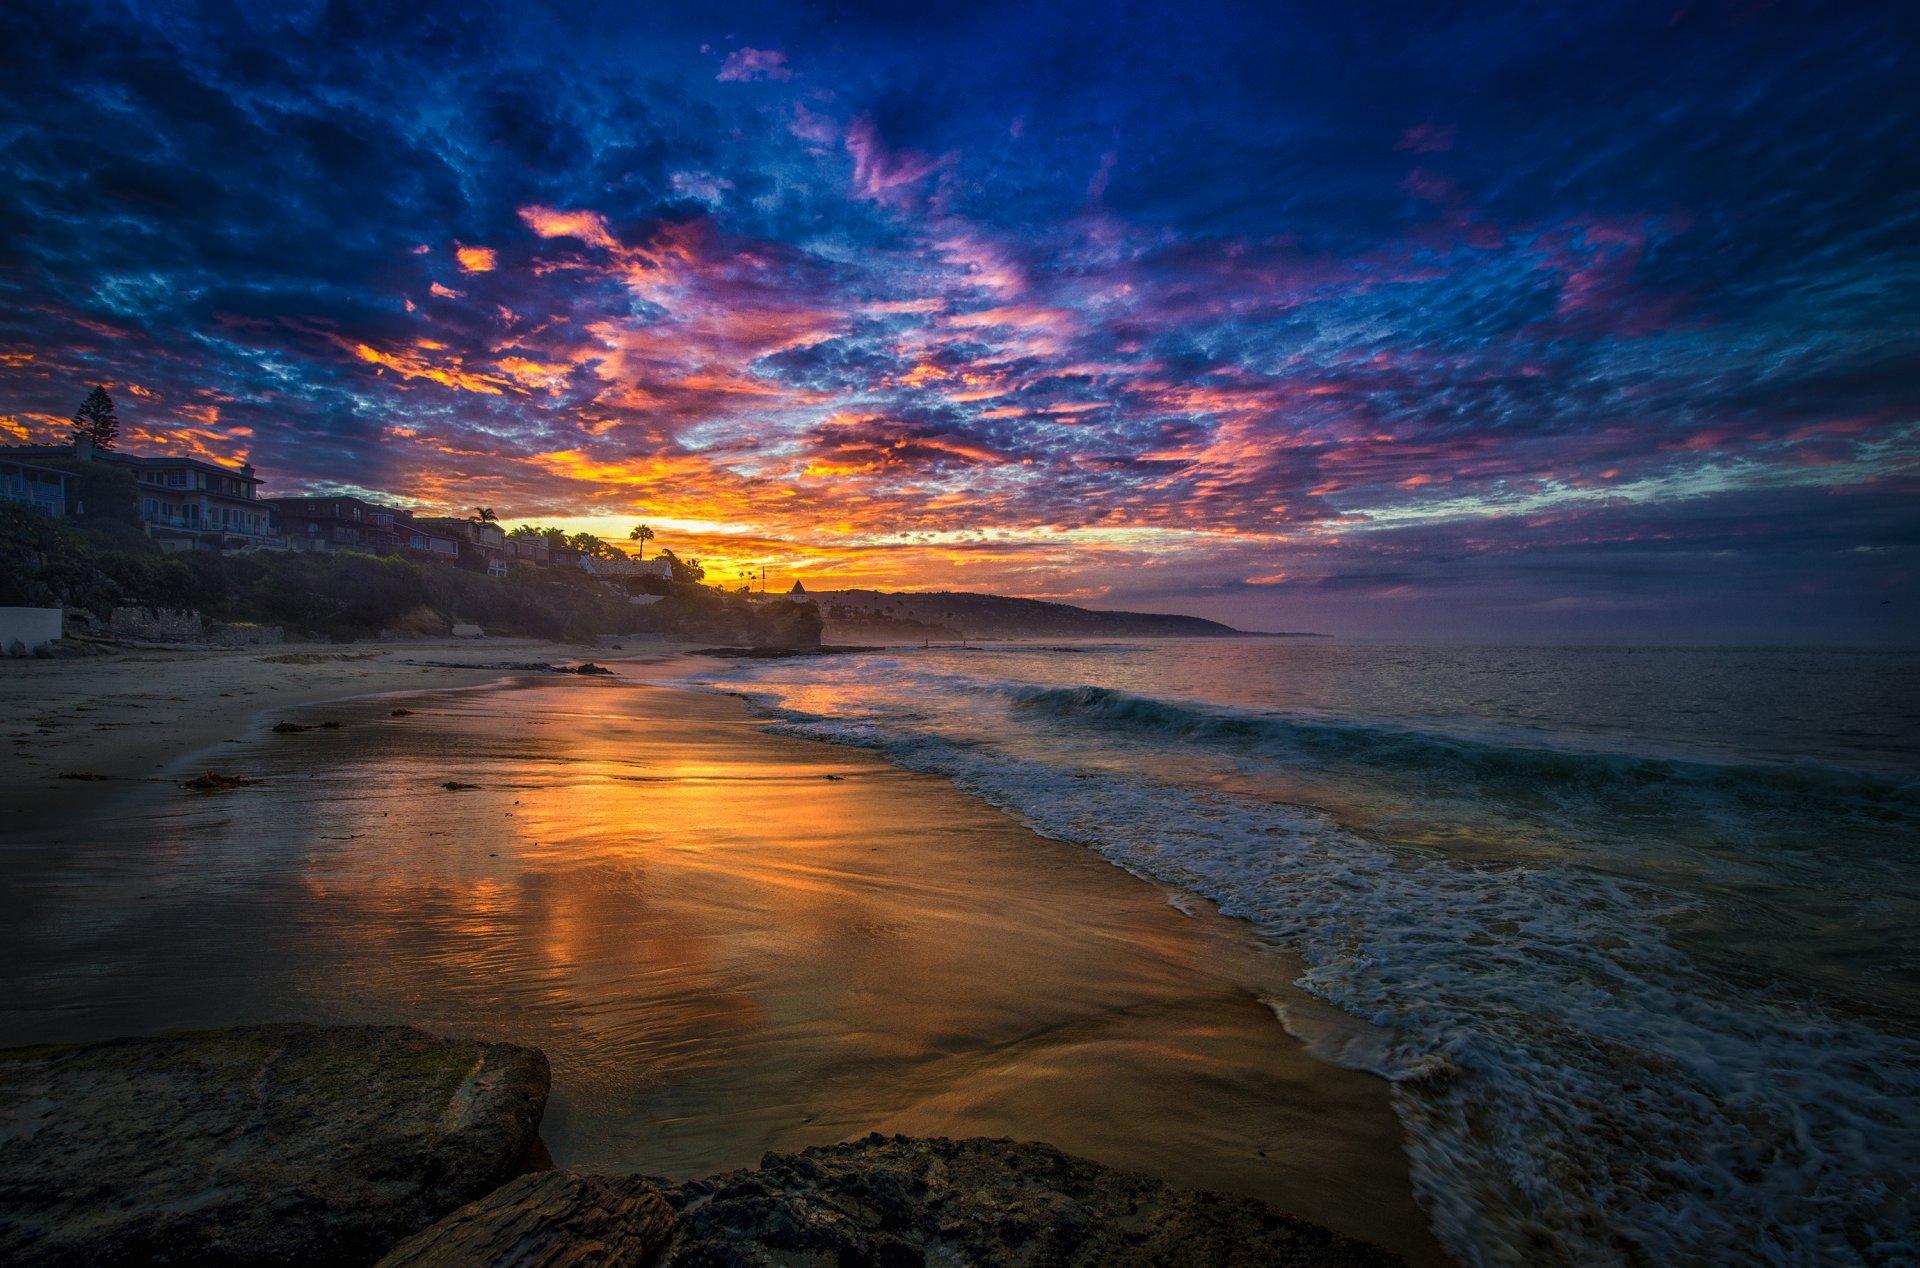 вечерний пейзаж на море картинки рекомендации